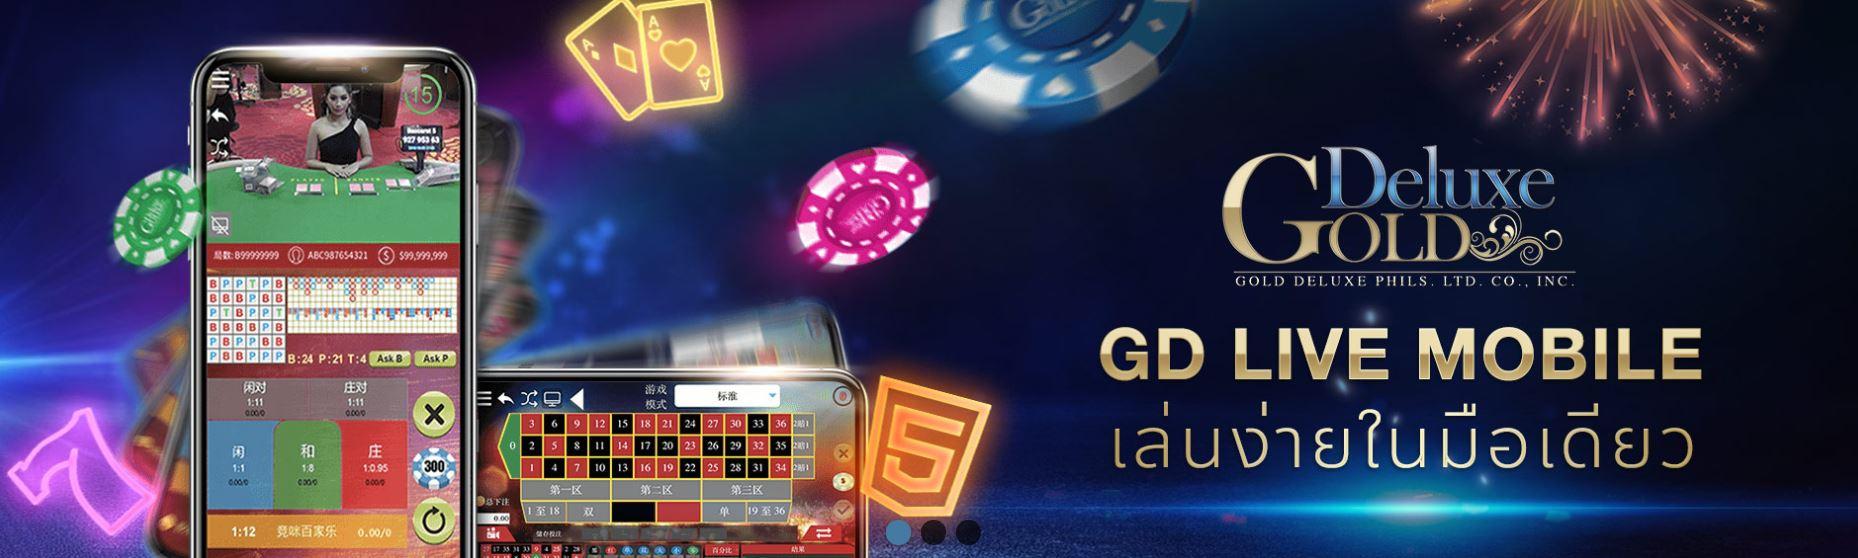 gold deluxe casino 3